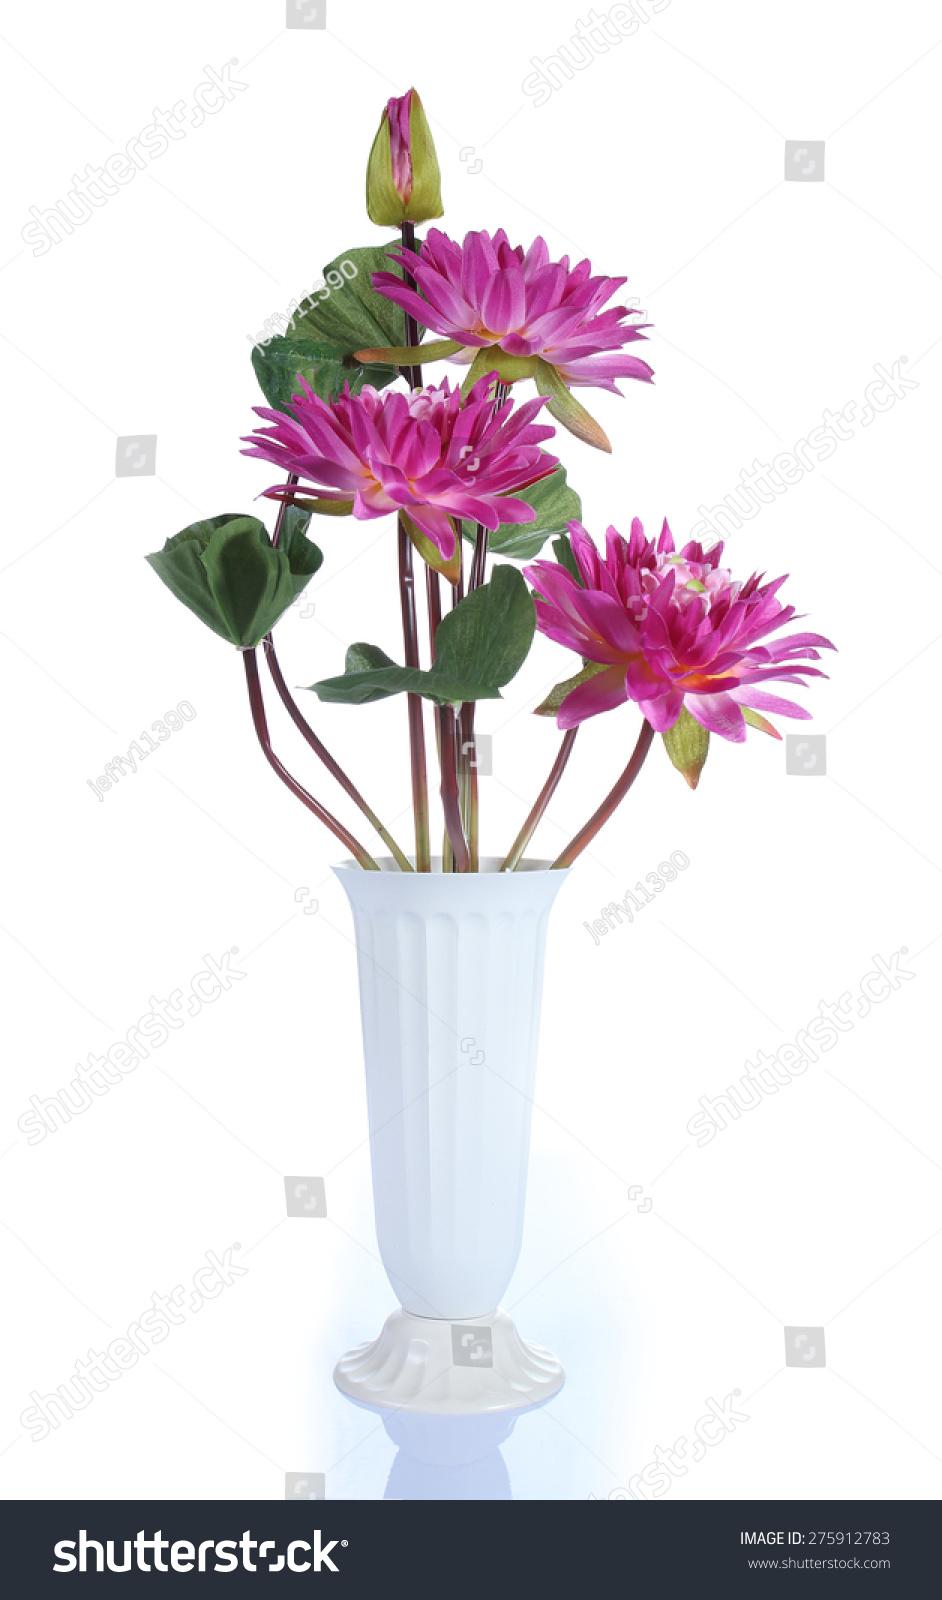 Red Lotus Flower In Vase On White Background Ez Canvas